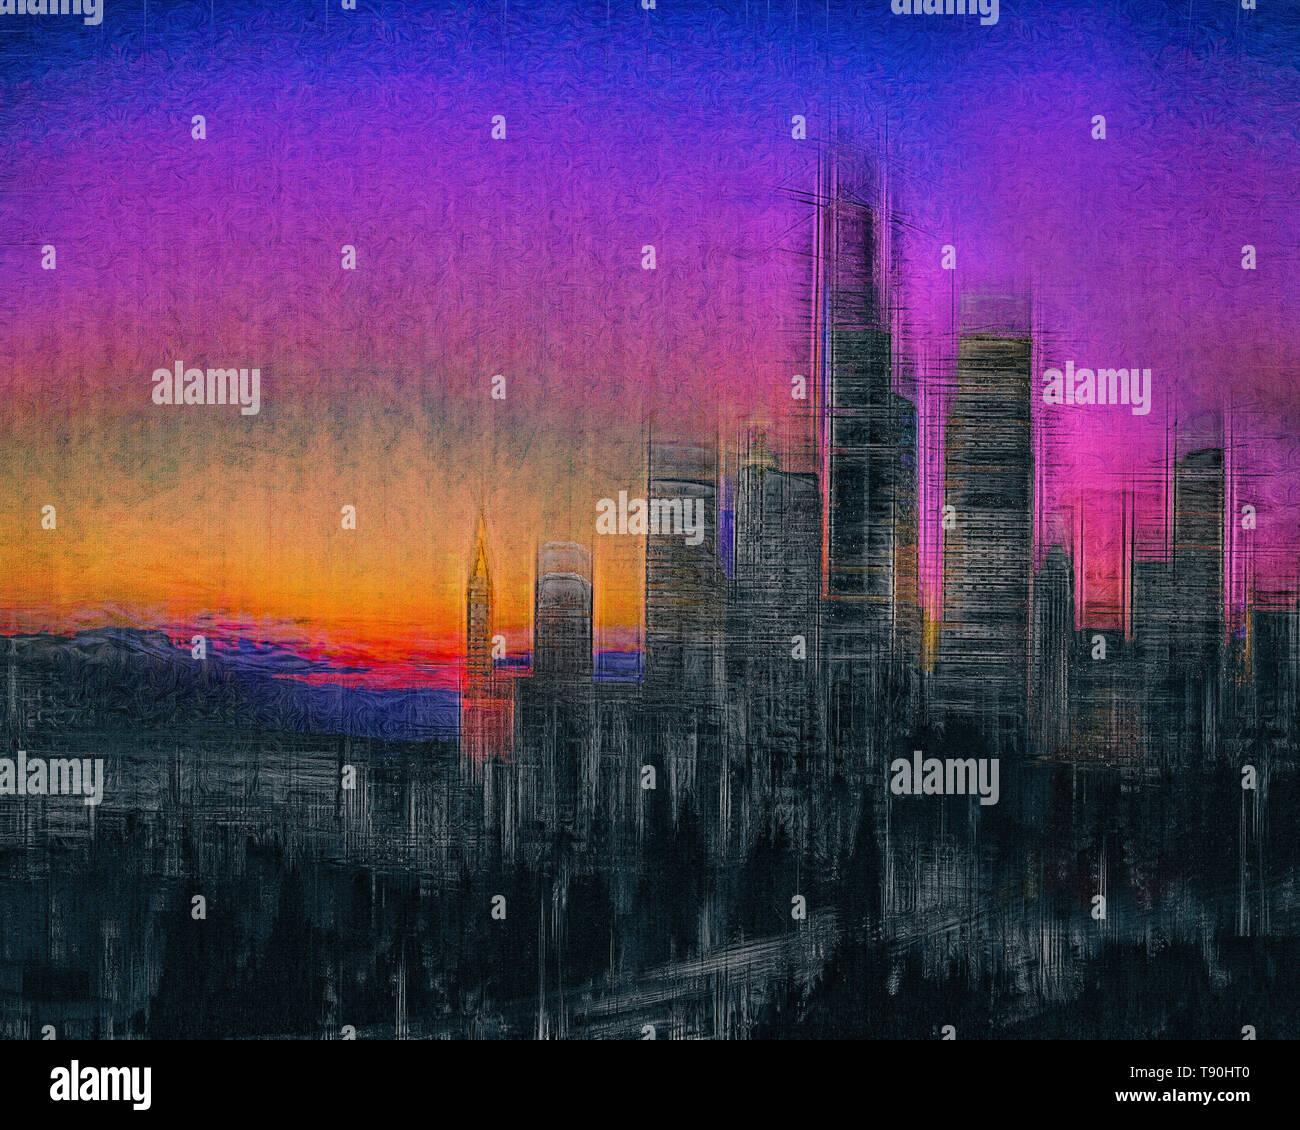 DIGITAL ART: The City  (Seattle, Washington, USA) - Stock Image